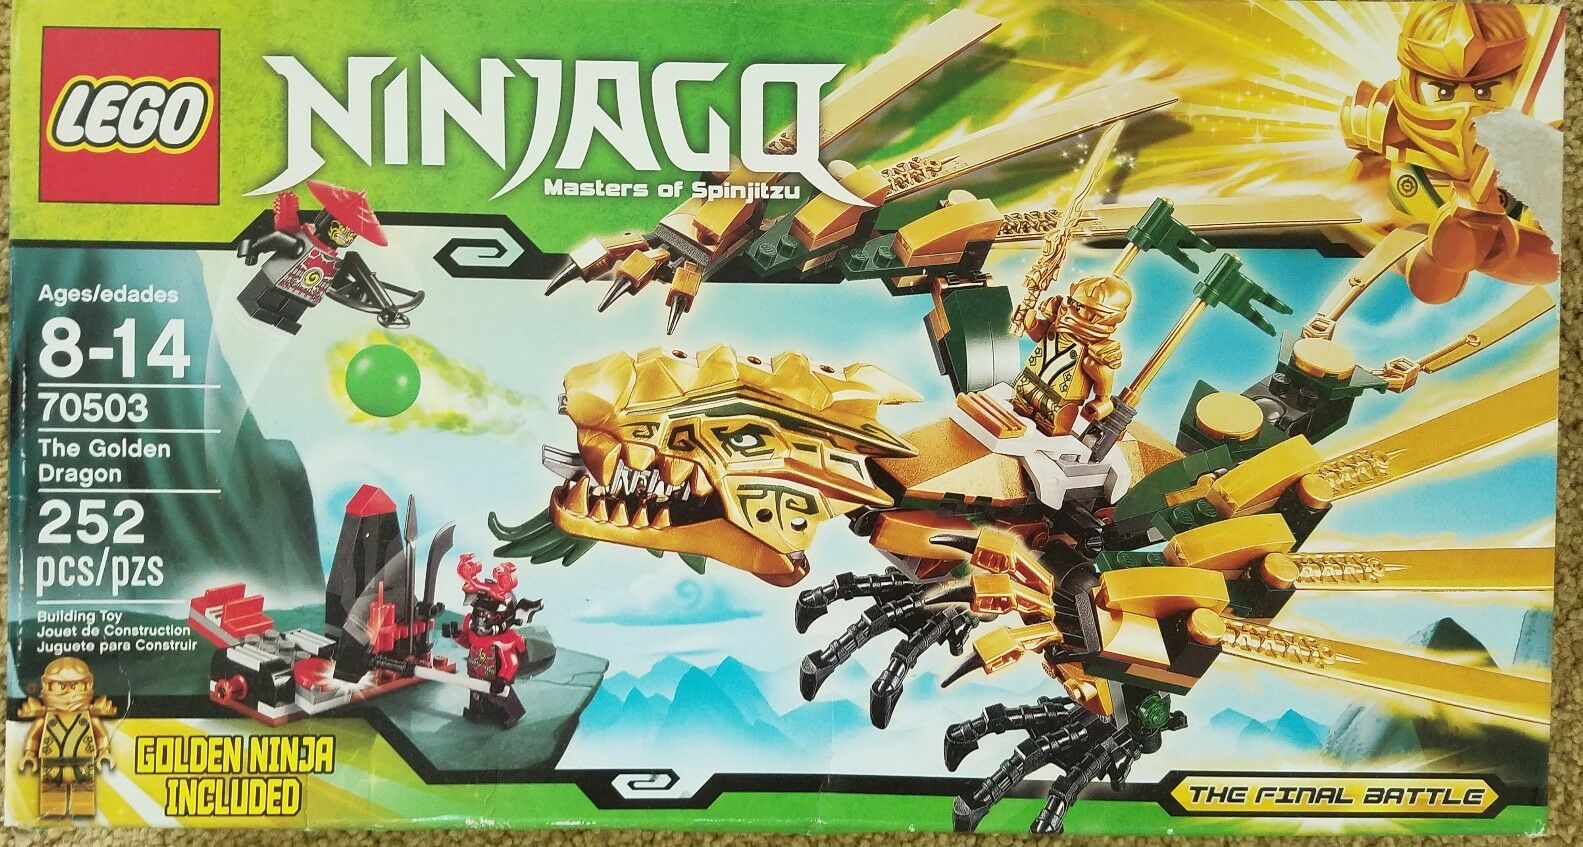 Lego Ninjago Masters of Spinjitzu 70503 Missing 1 Pc